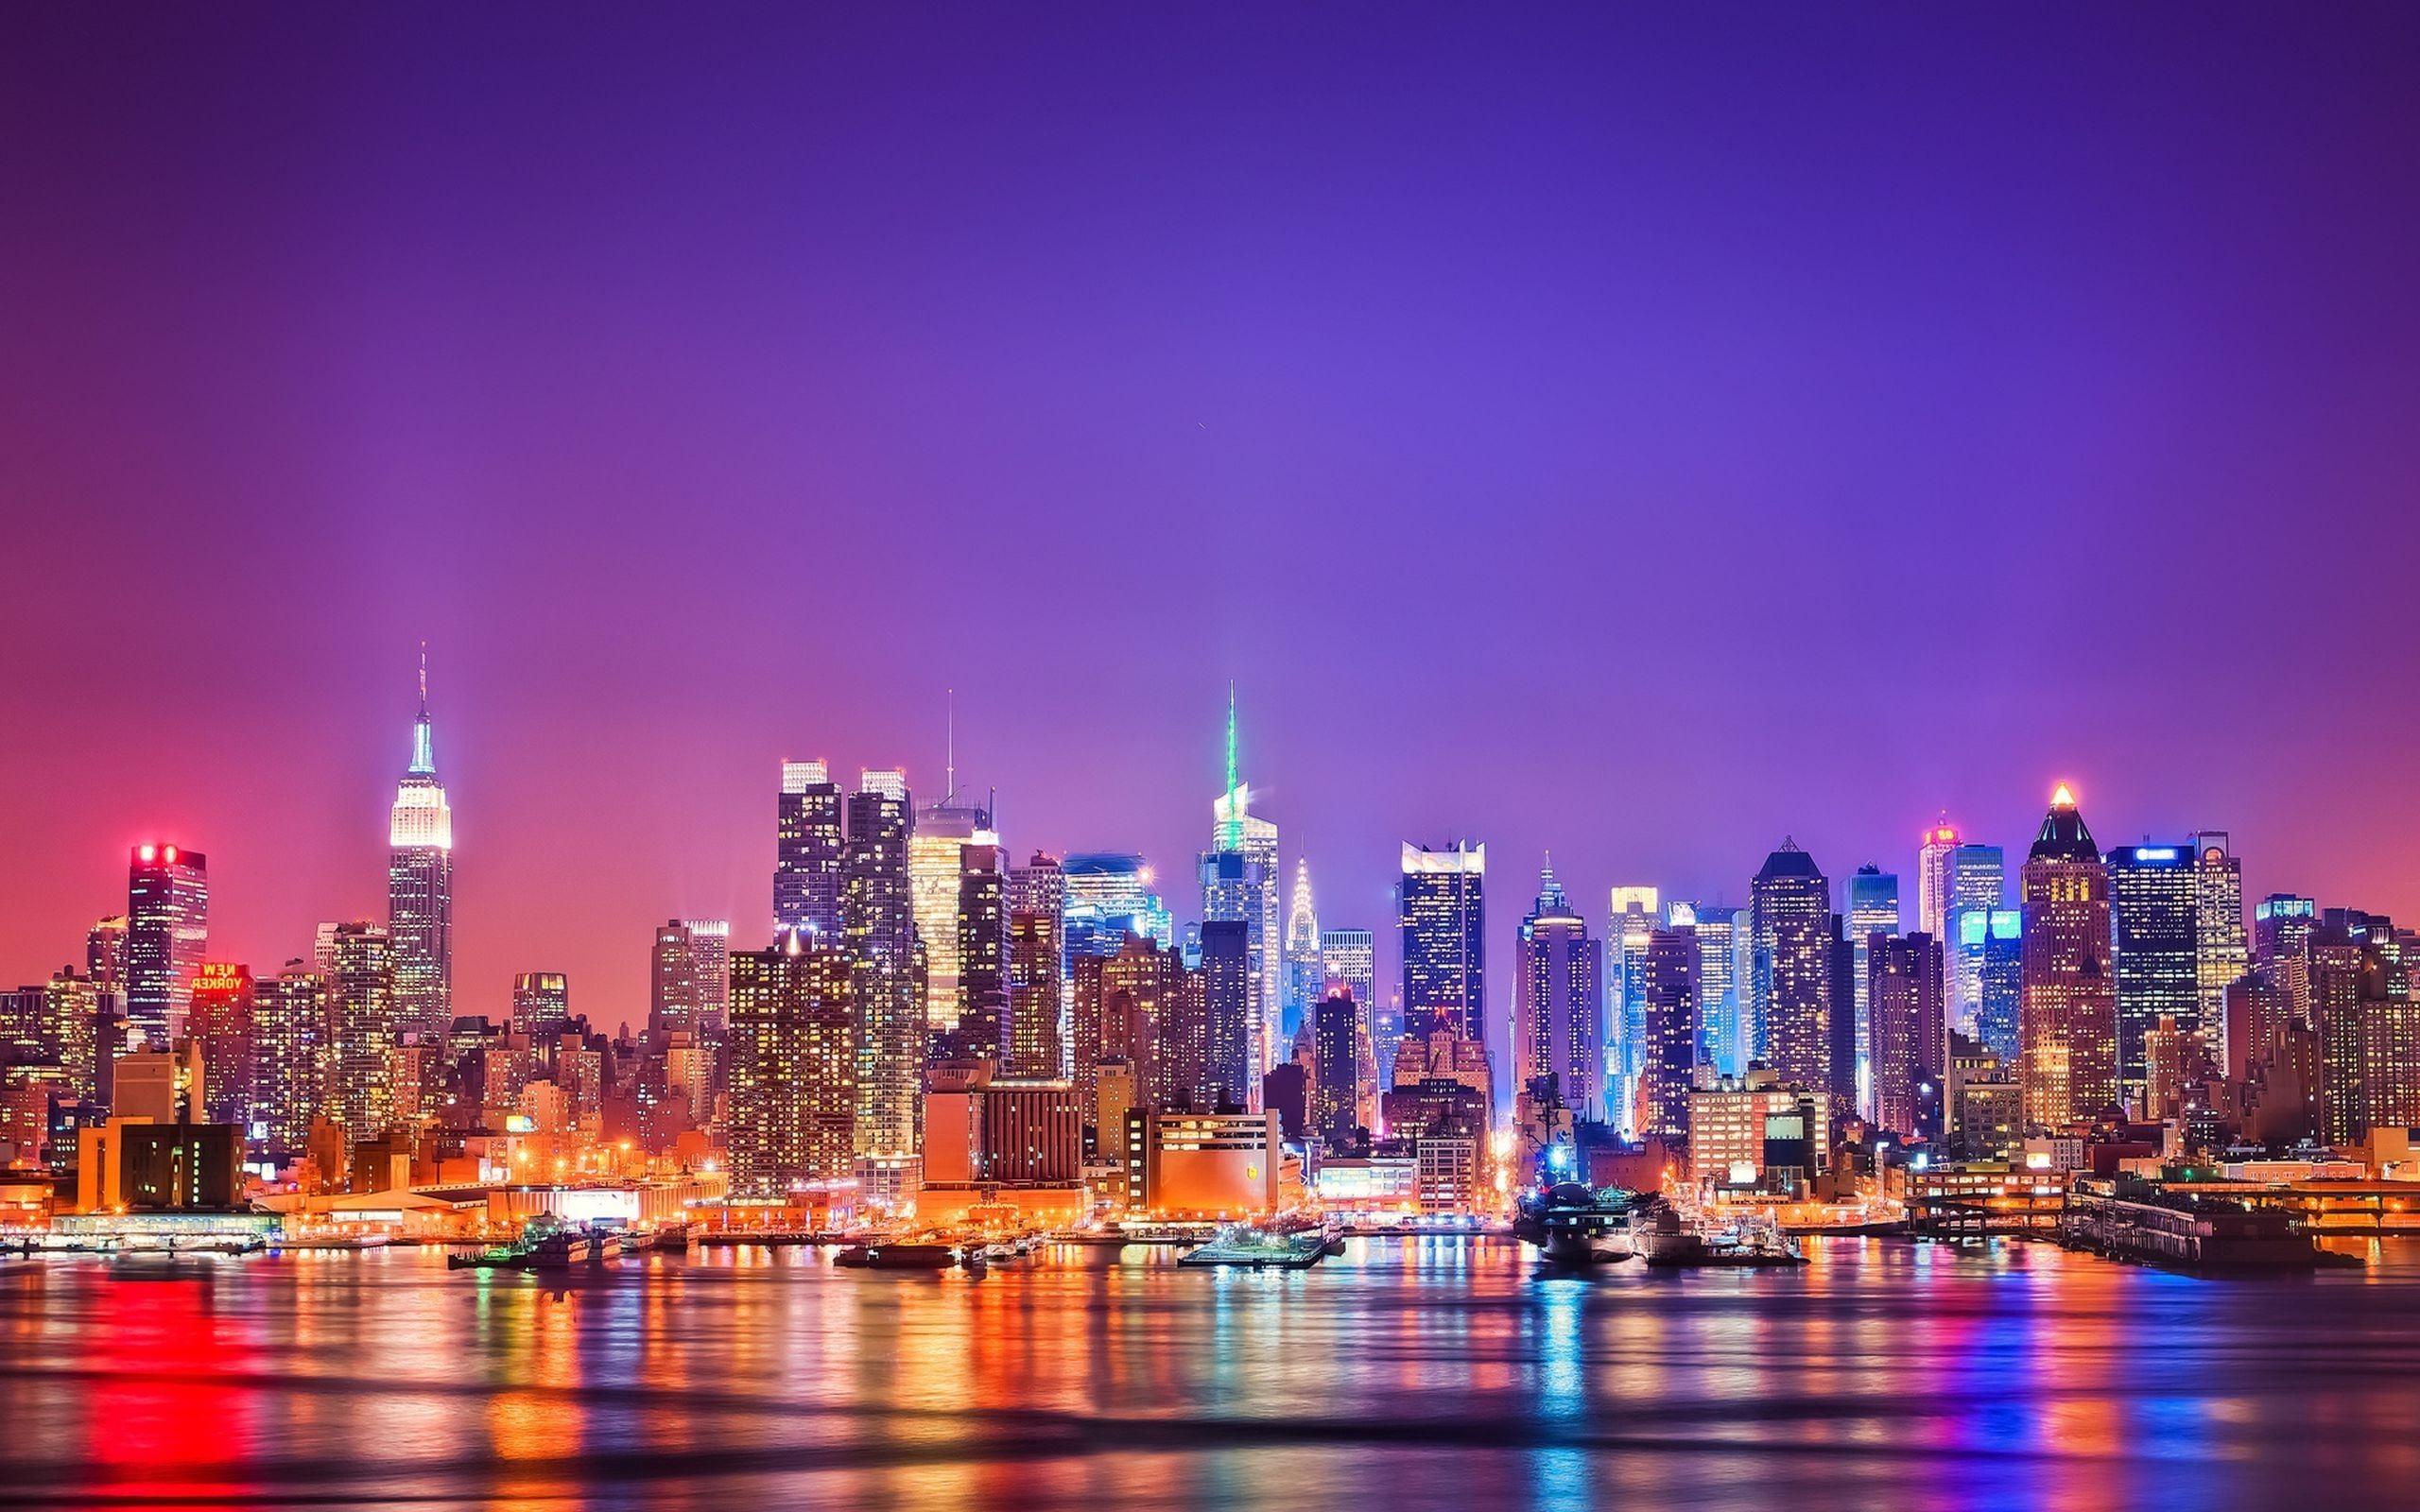 New York At Night Wallpaper Widescreen Resolution – Wallpaper